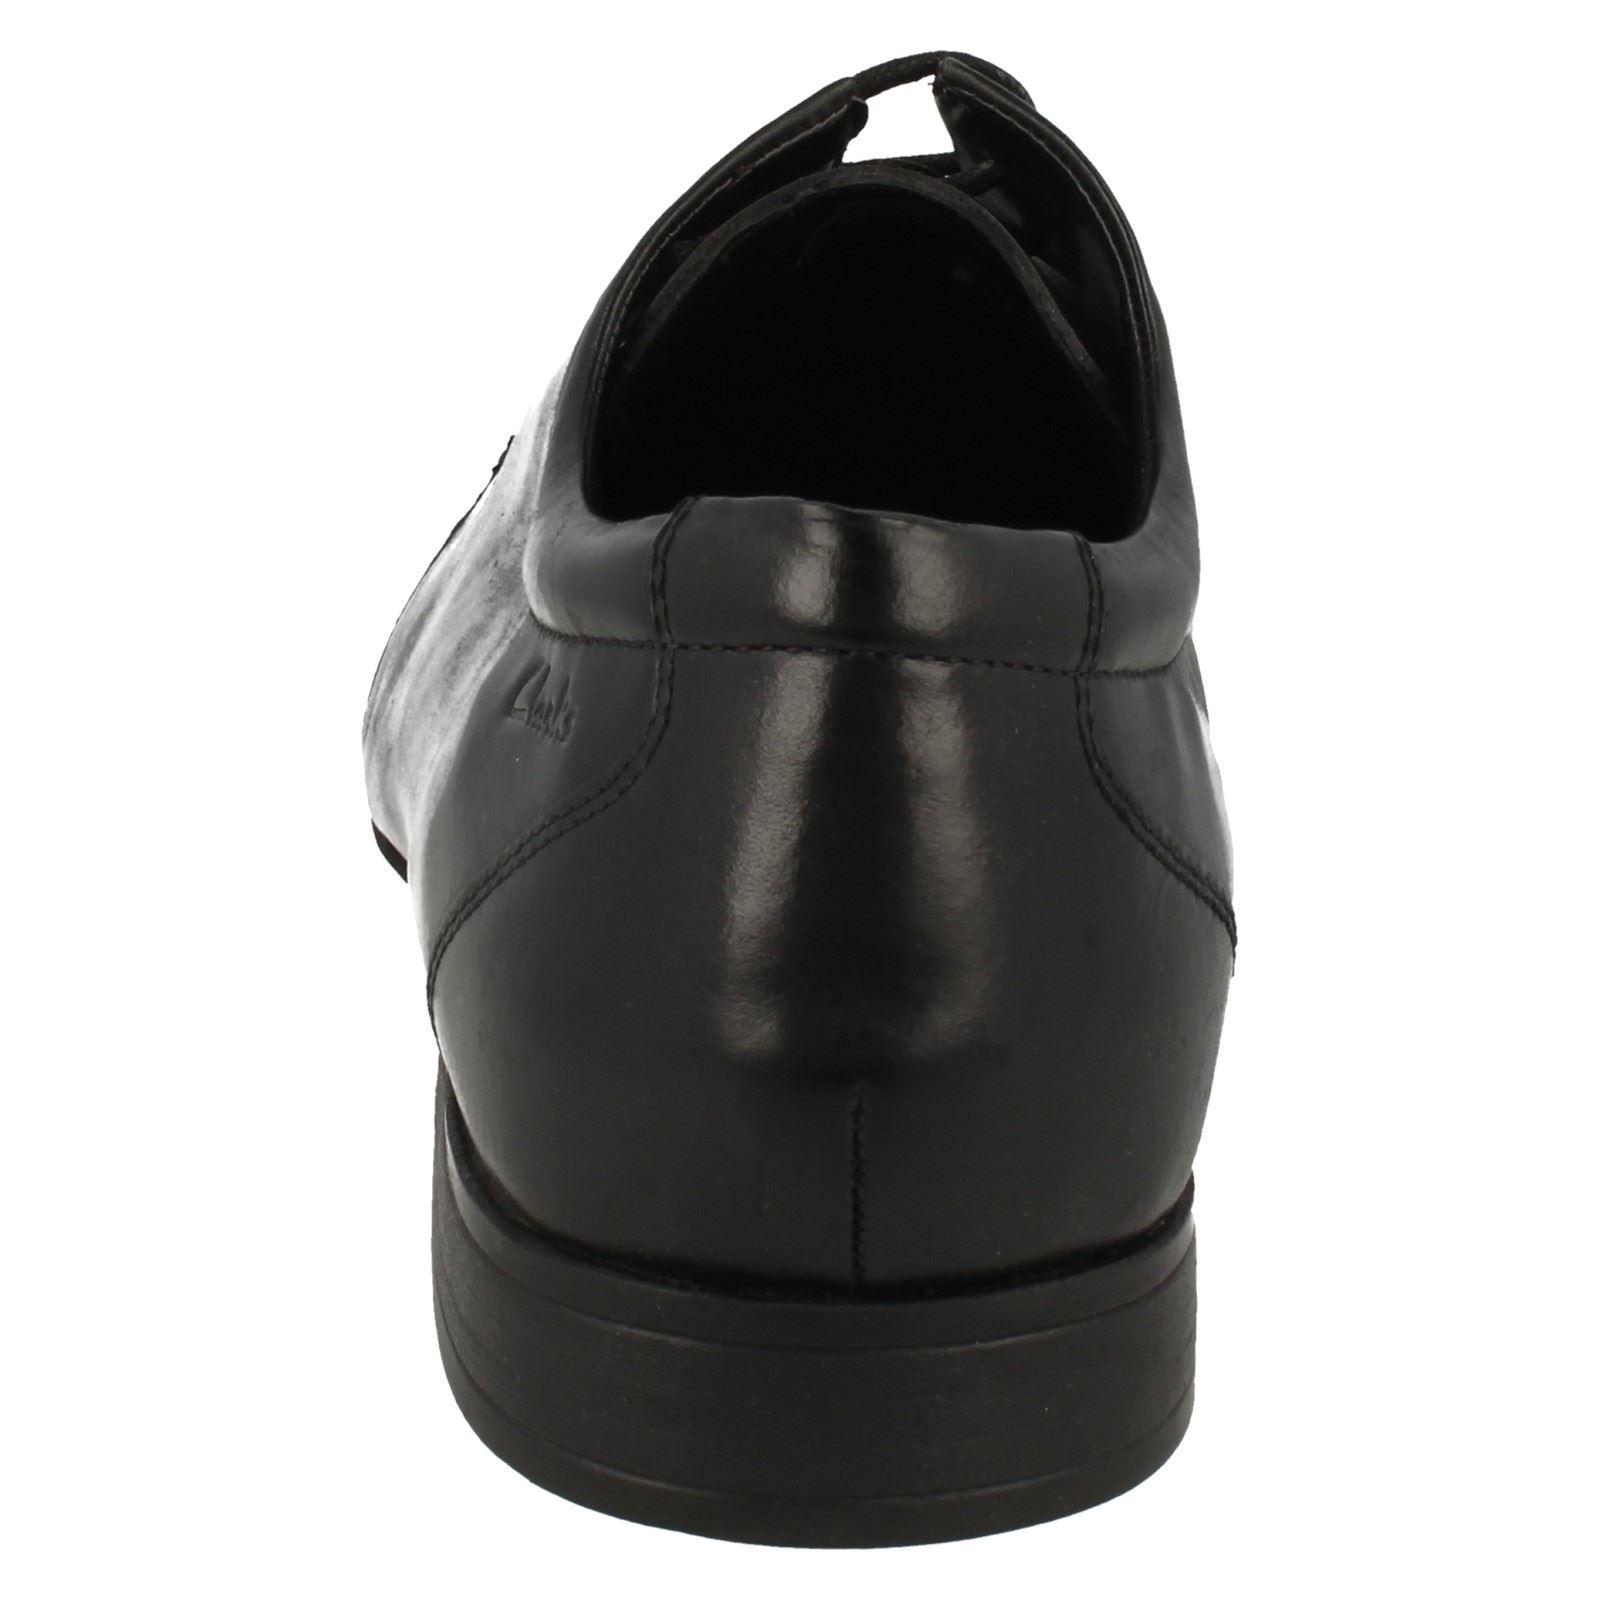 Hombre Hombre Hombre Clarks Smart Lace Up Zapatos - Agility Mode c3bf9e